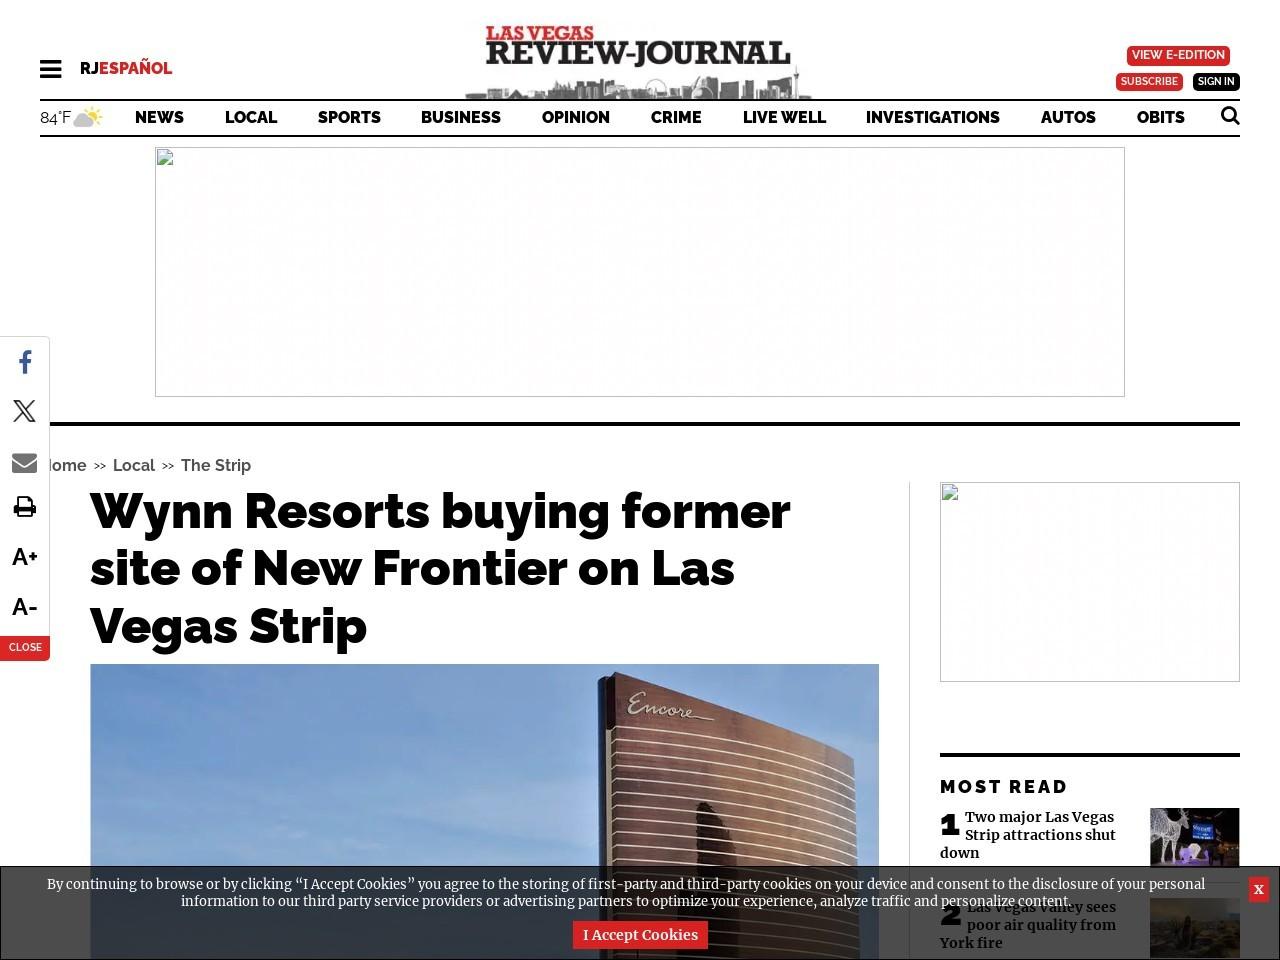 Wynn Resorts buying former site of New Frontier on Las Vegas Strip